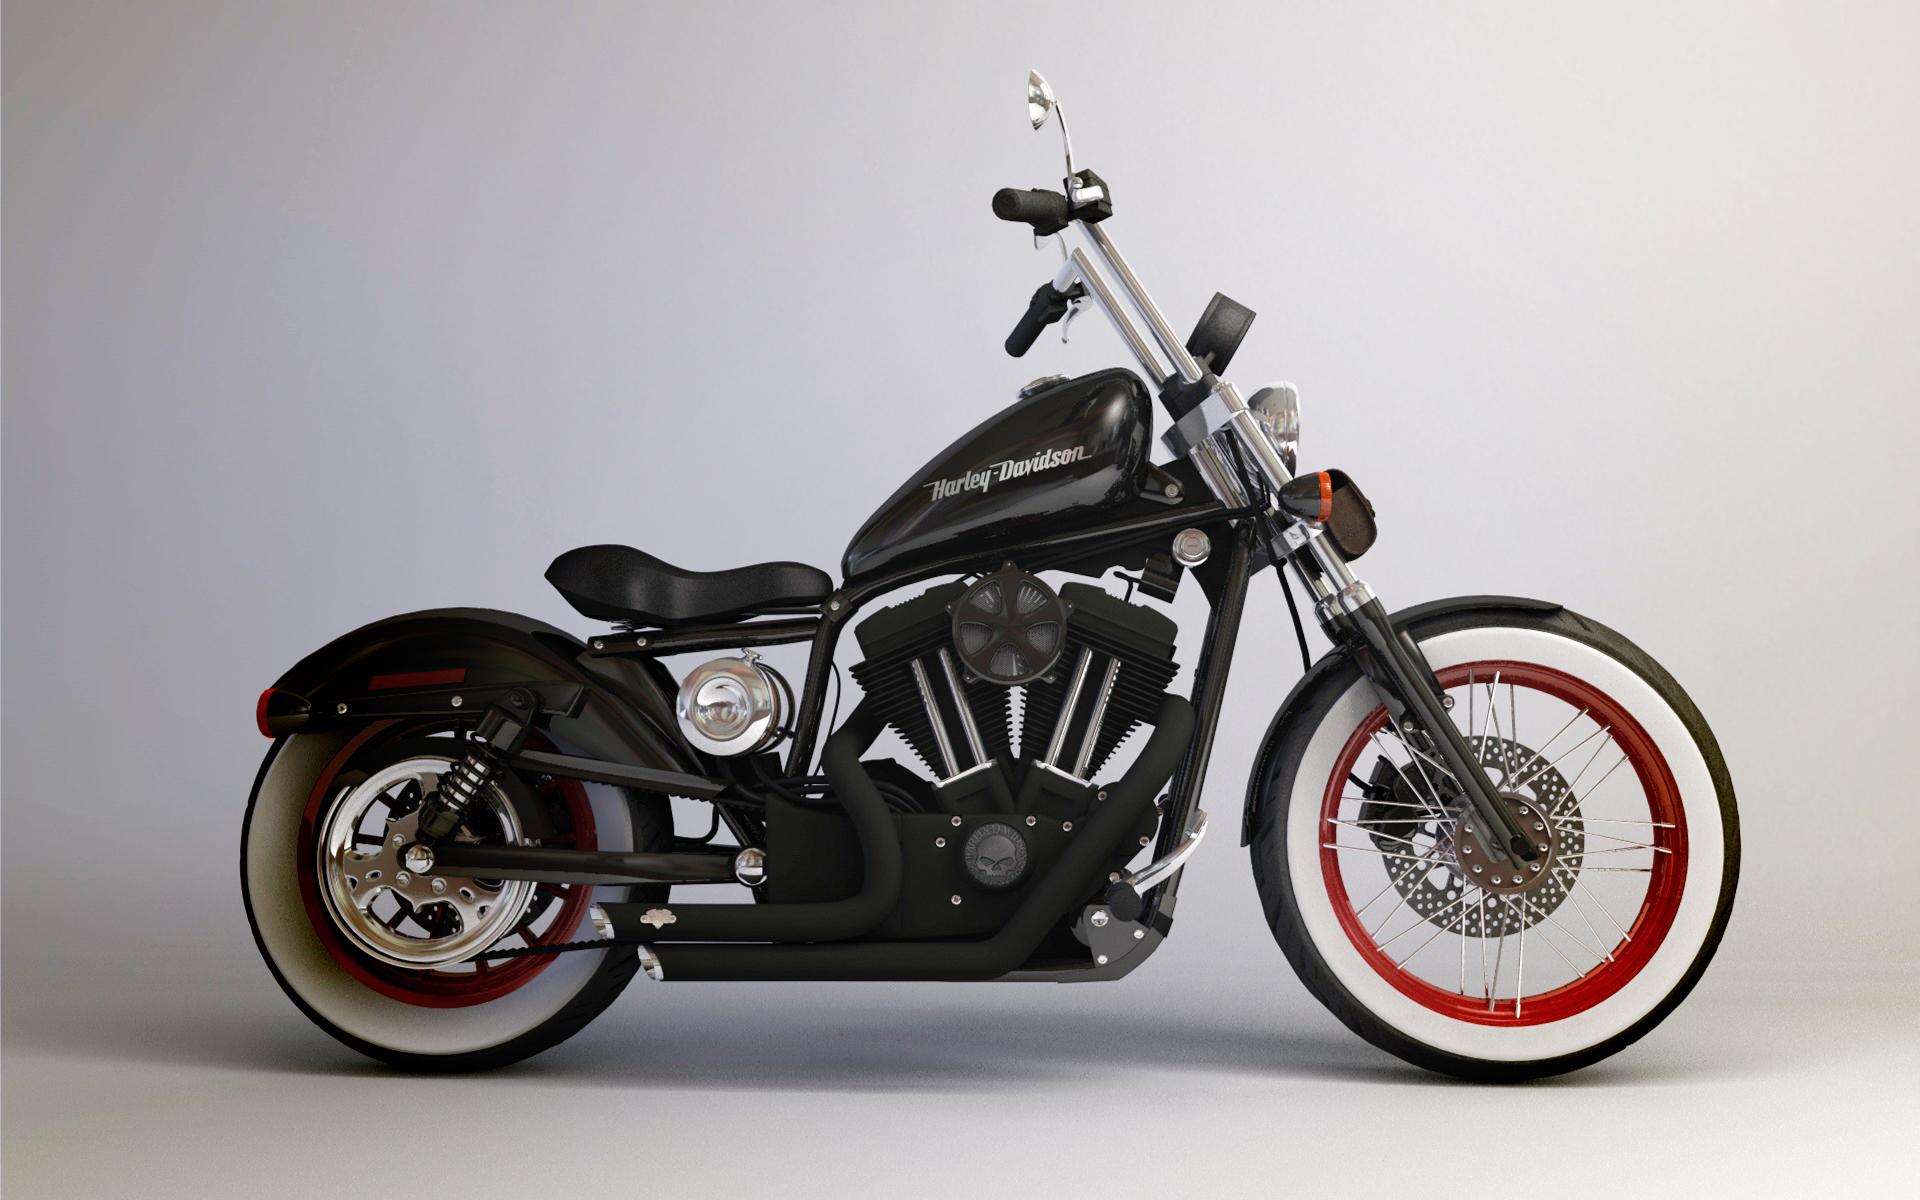 Harley Davidson Starting Price In Lucknow